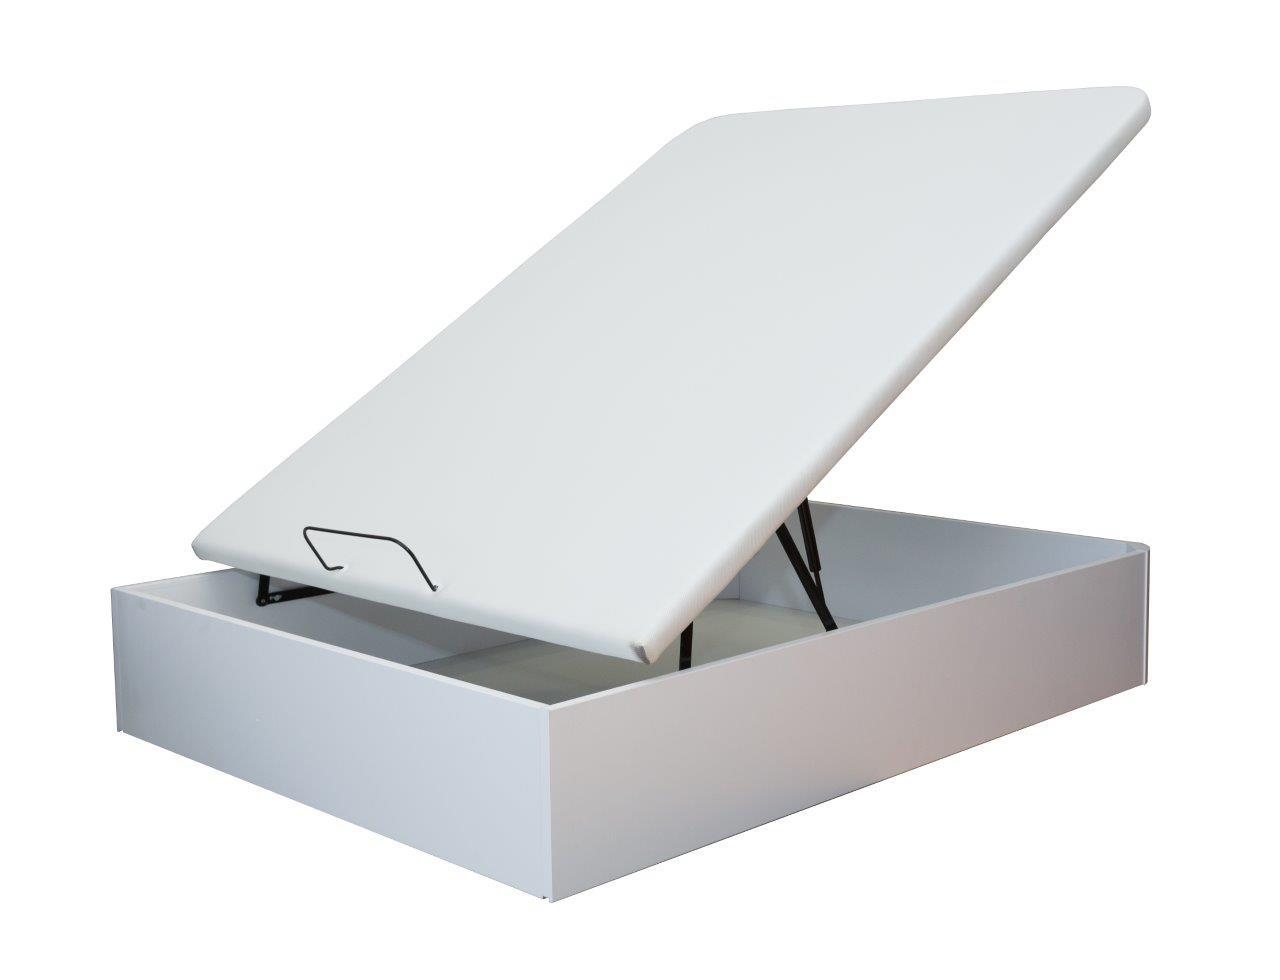 Canapé Blanco FLEX BOX 3D II ◇ 455715